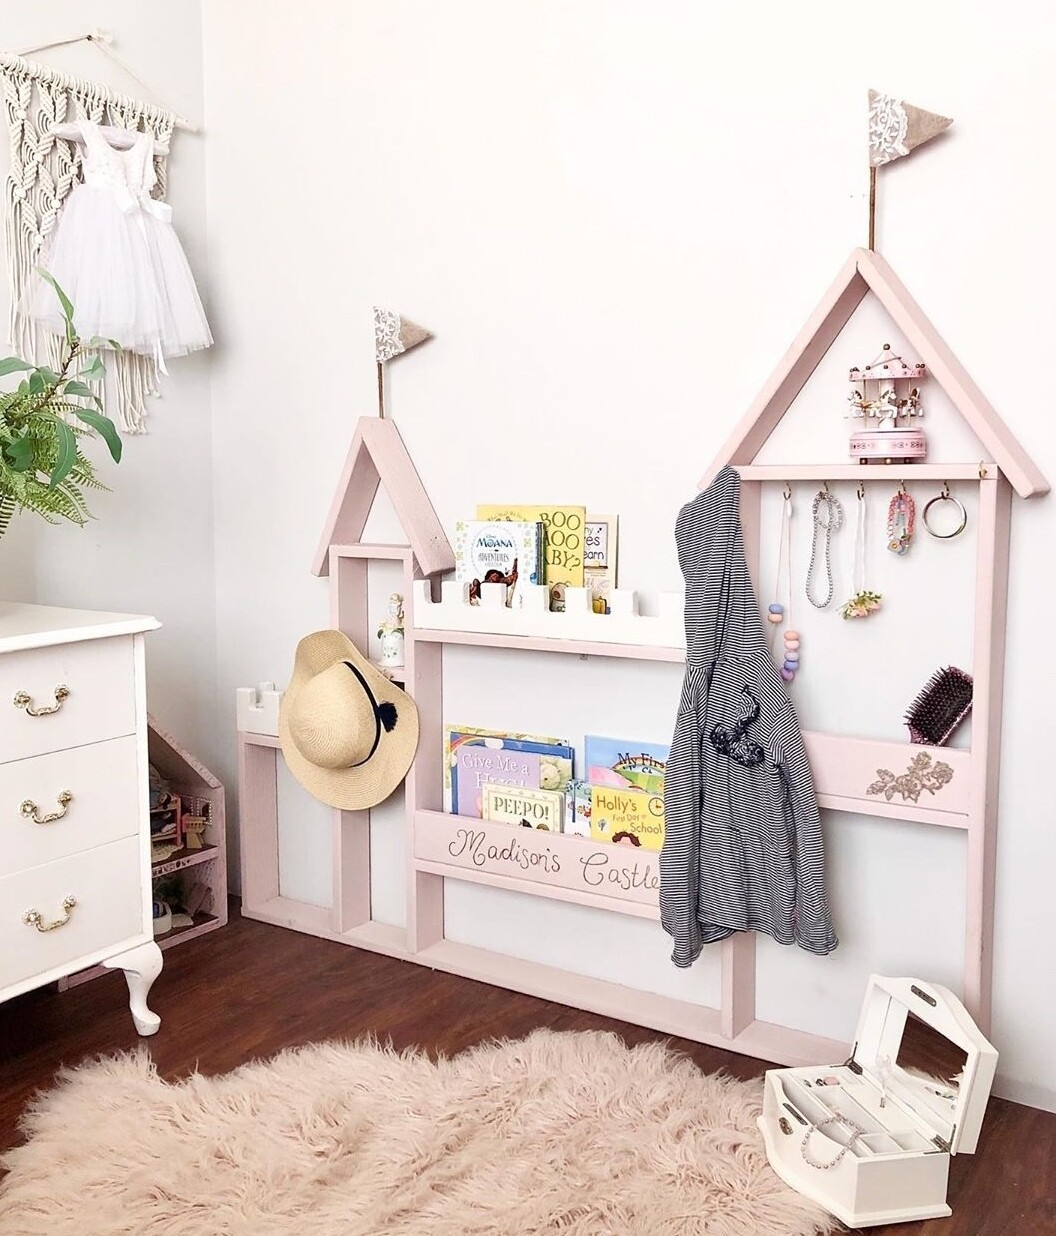 Princess Castel Wall Book and Storage Shelf - Personlized